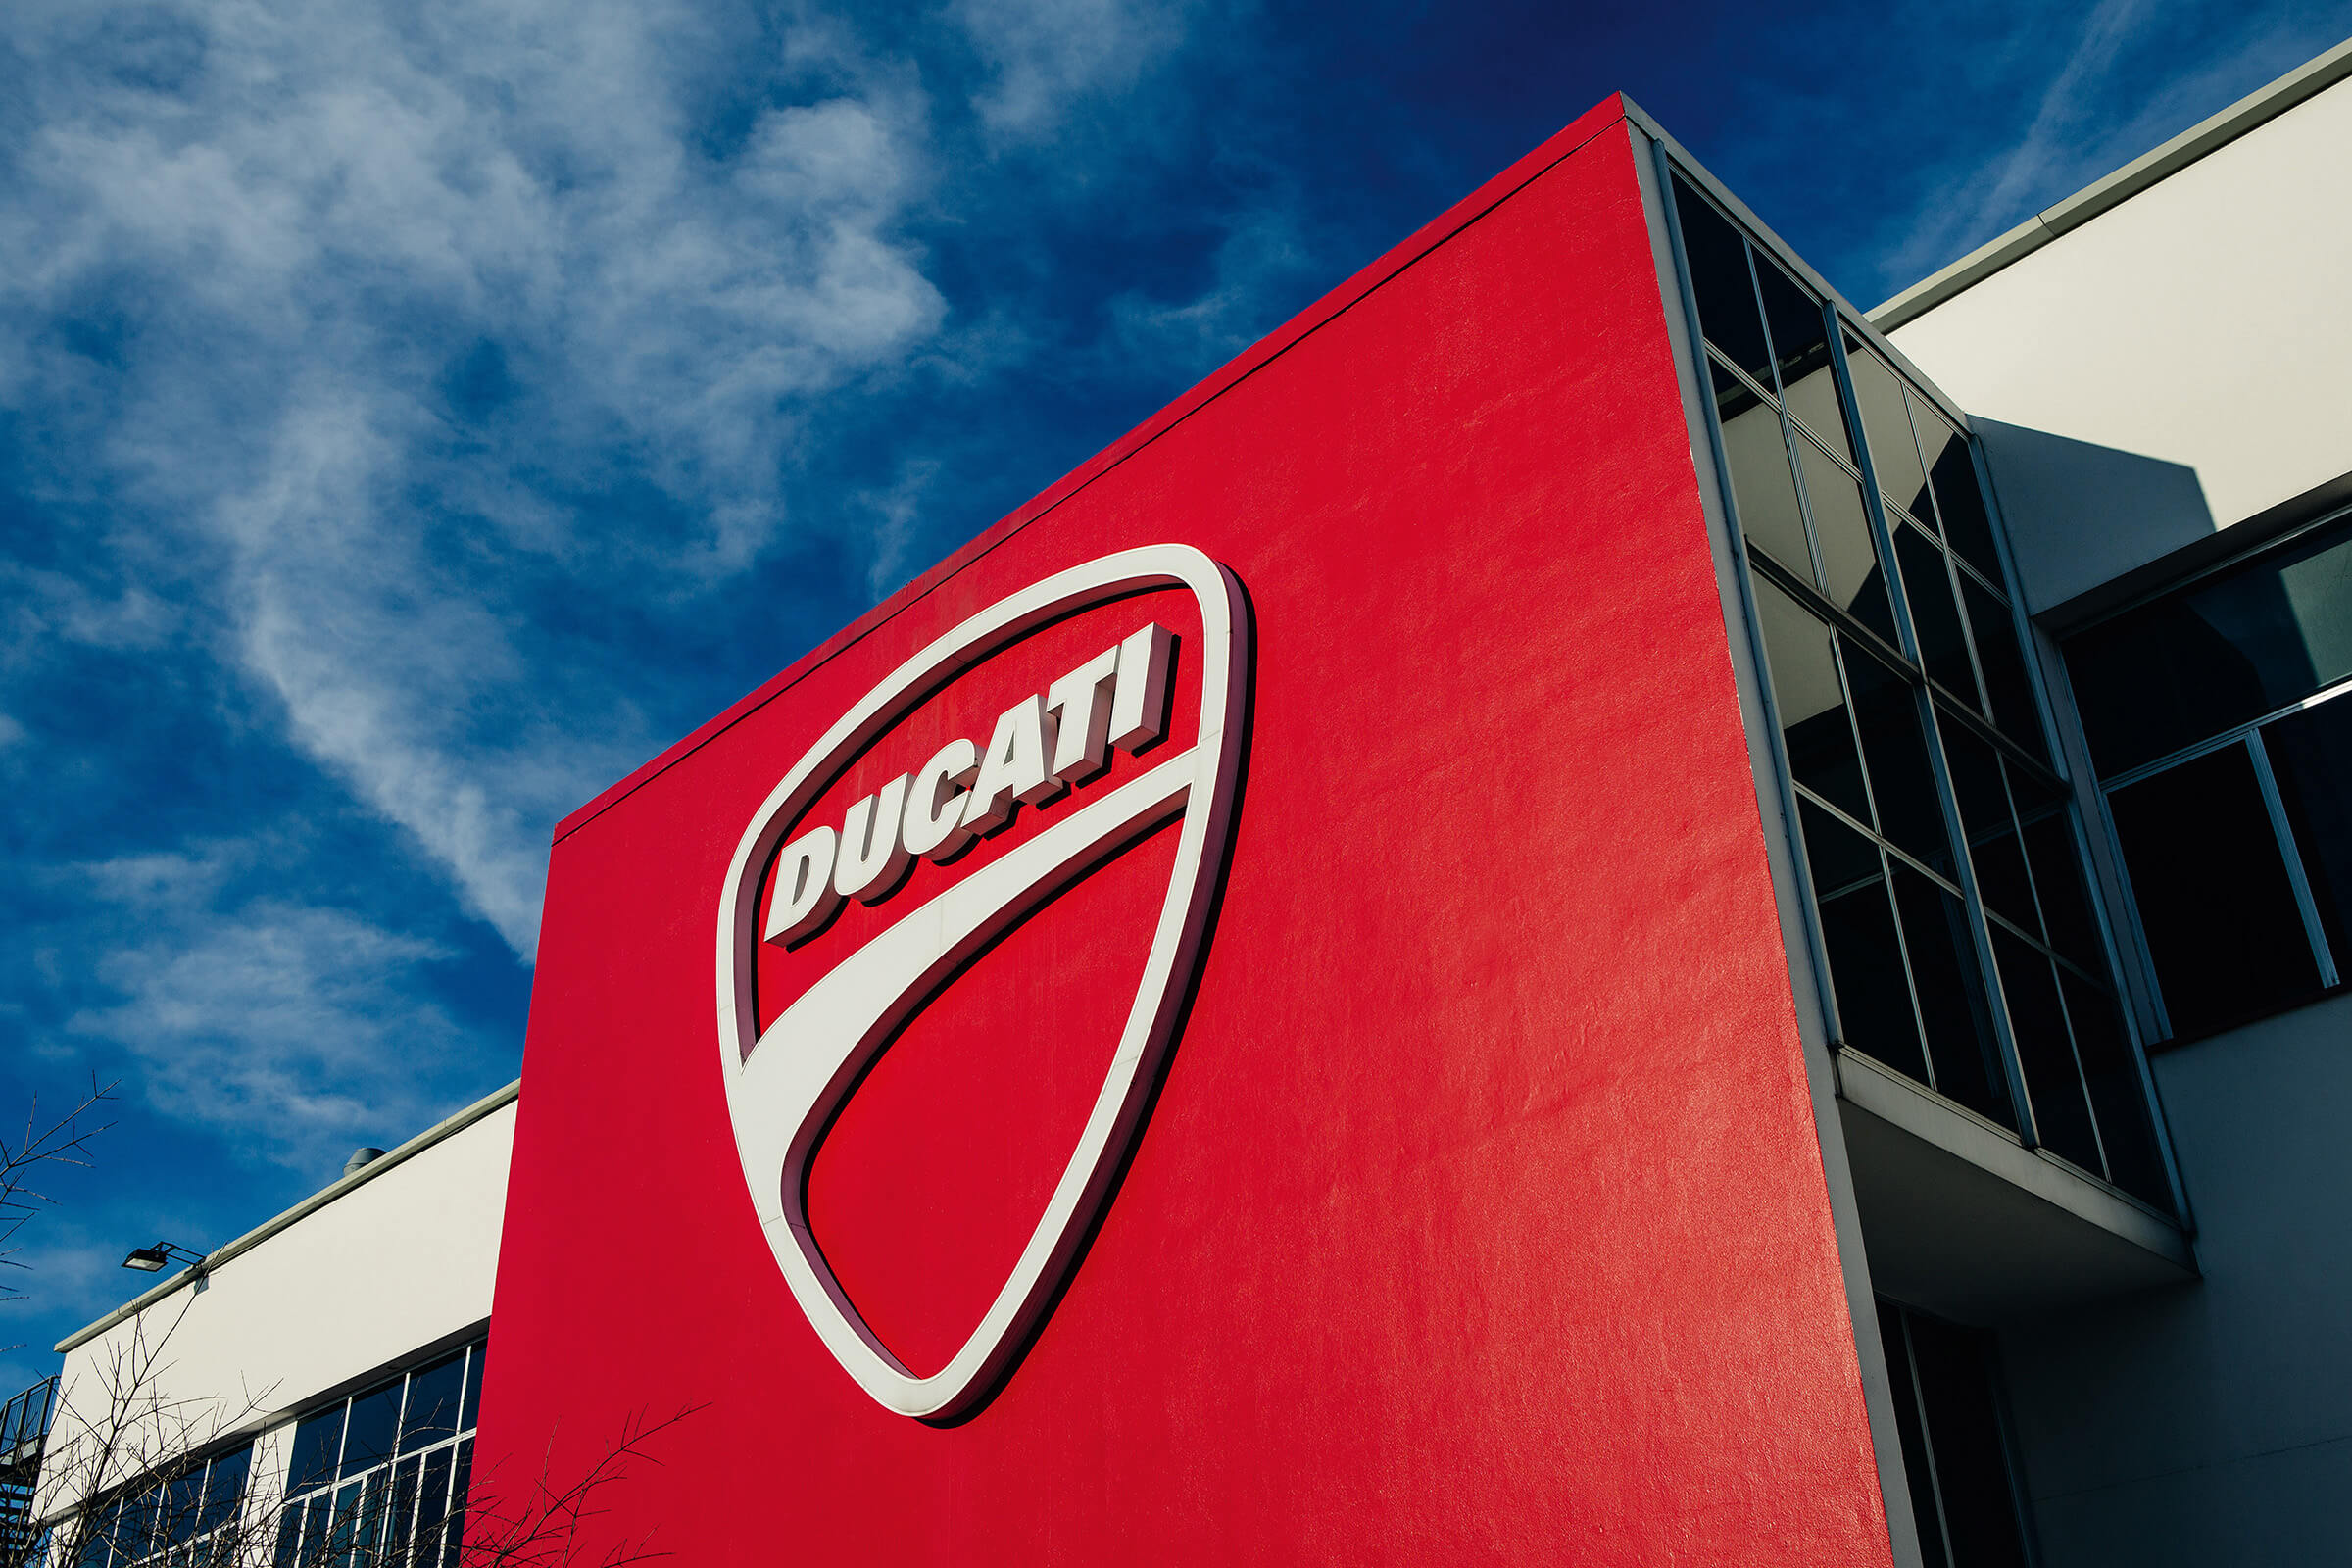 Ducati Motor Holding SPA